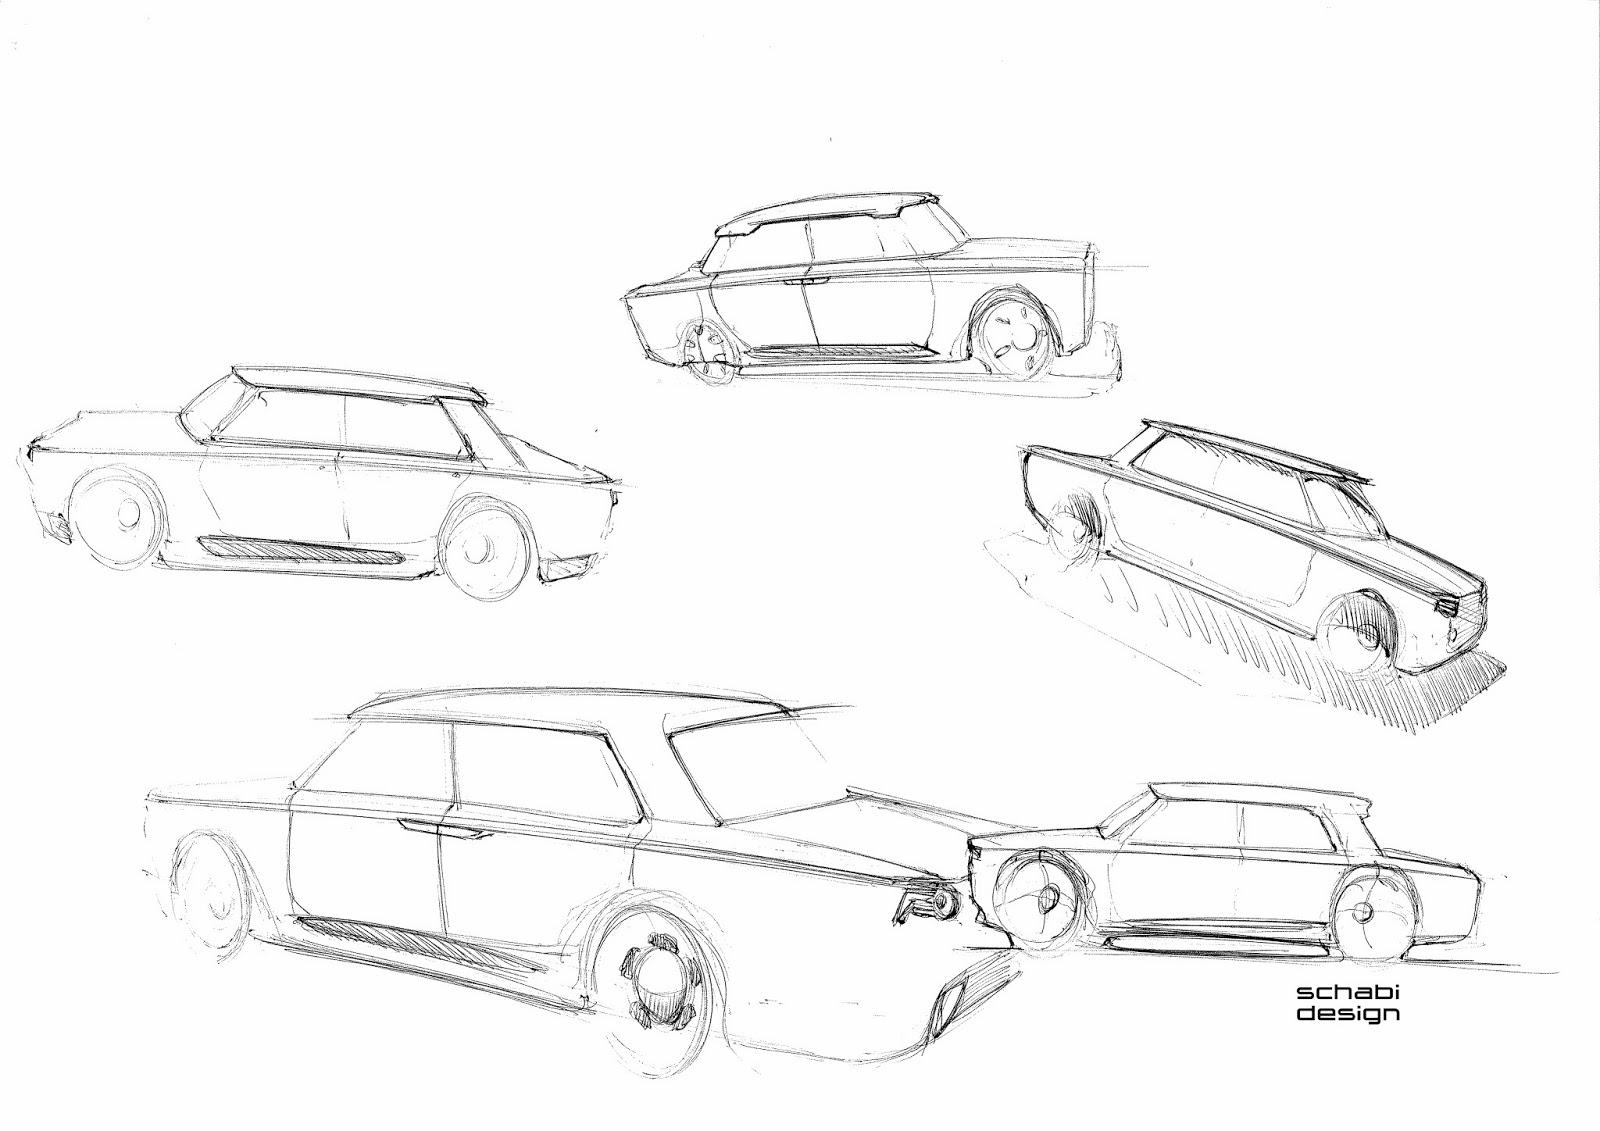 Schabi Design Sketch Site: Fiat 1500 Concept Sketches